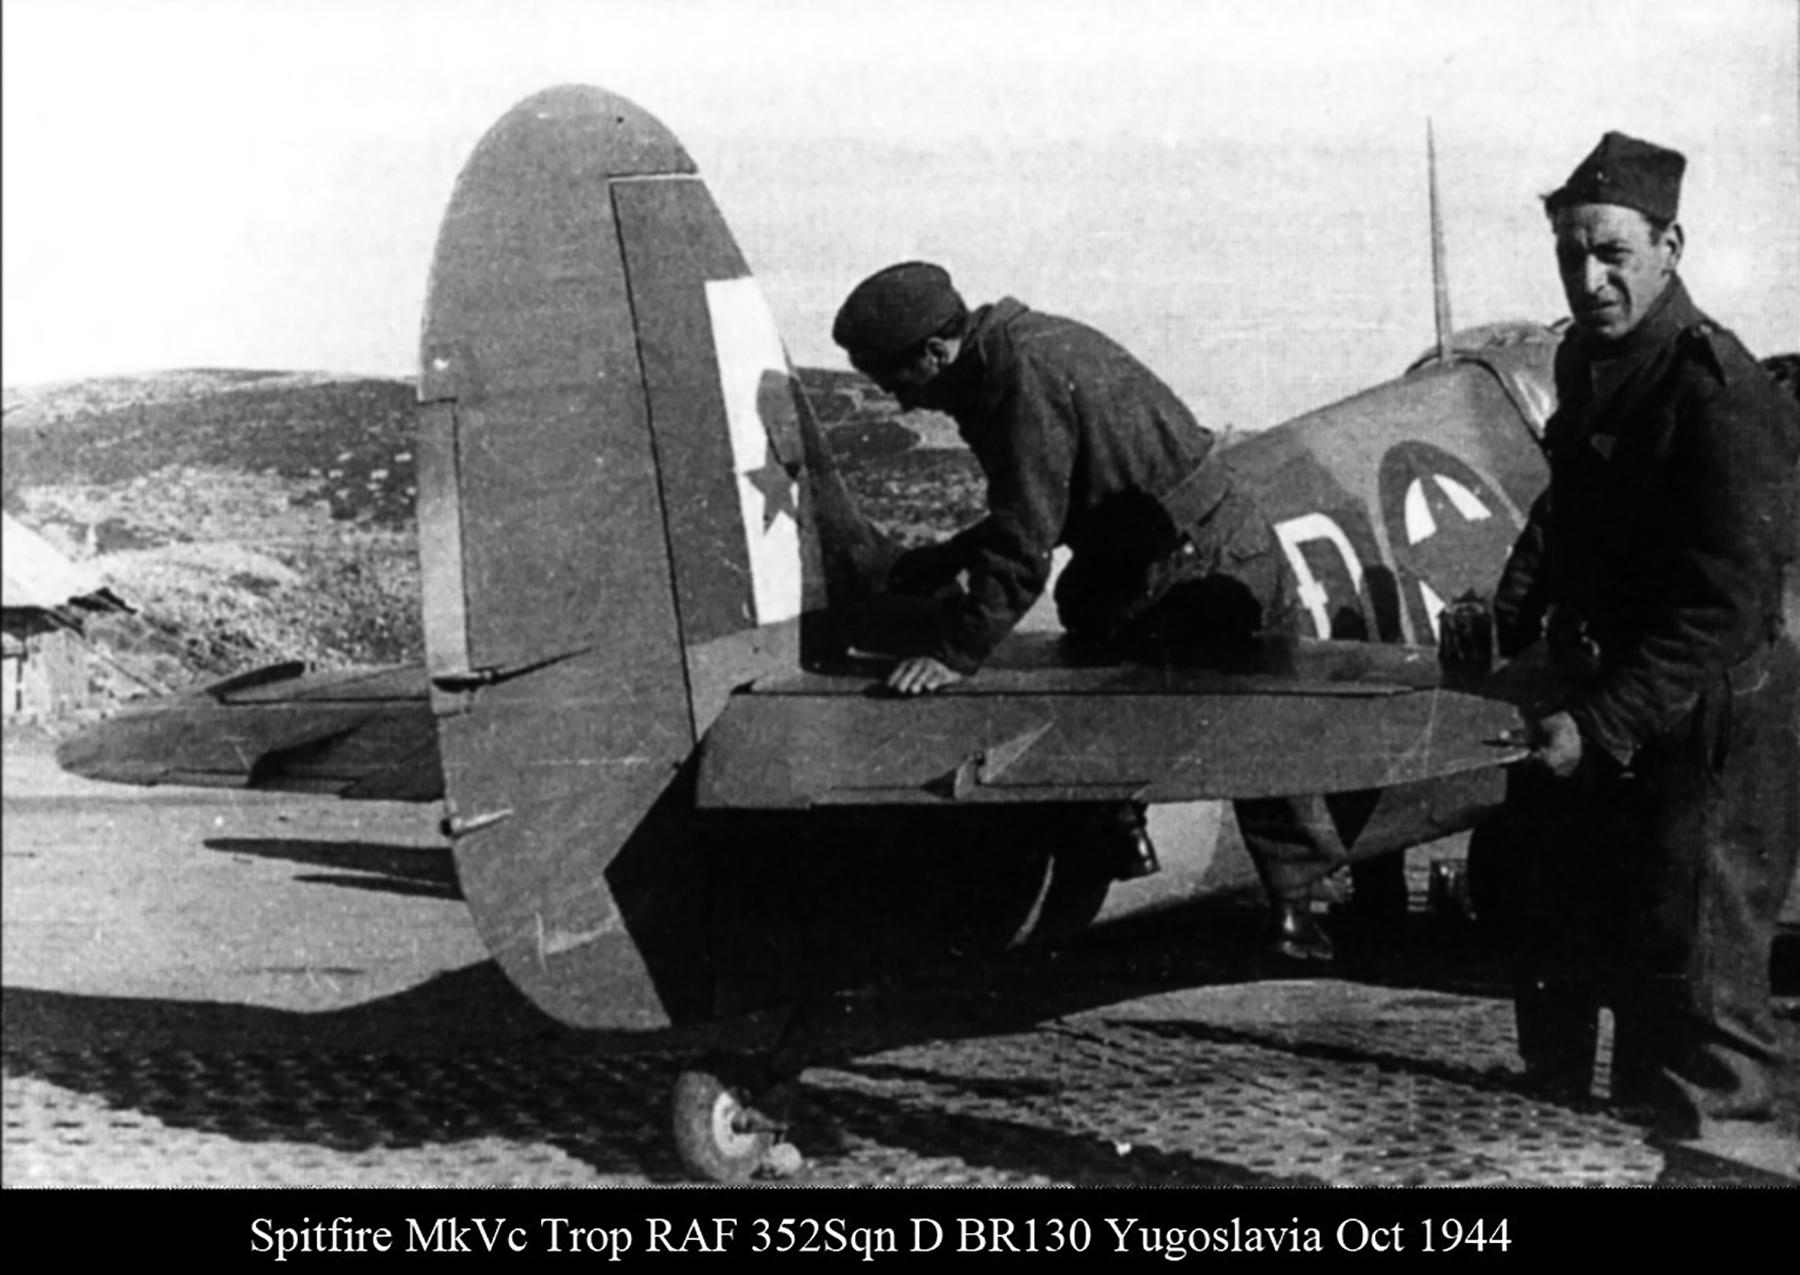 Spitfire MkVcTrop RAF 352Sqn D BR130 Yugoslavia Oct 1944 01